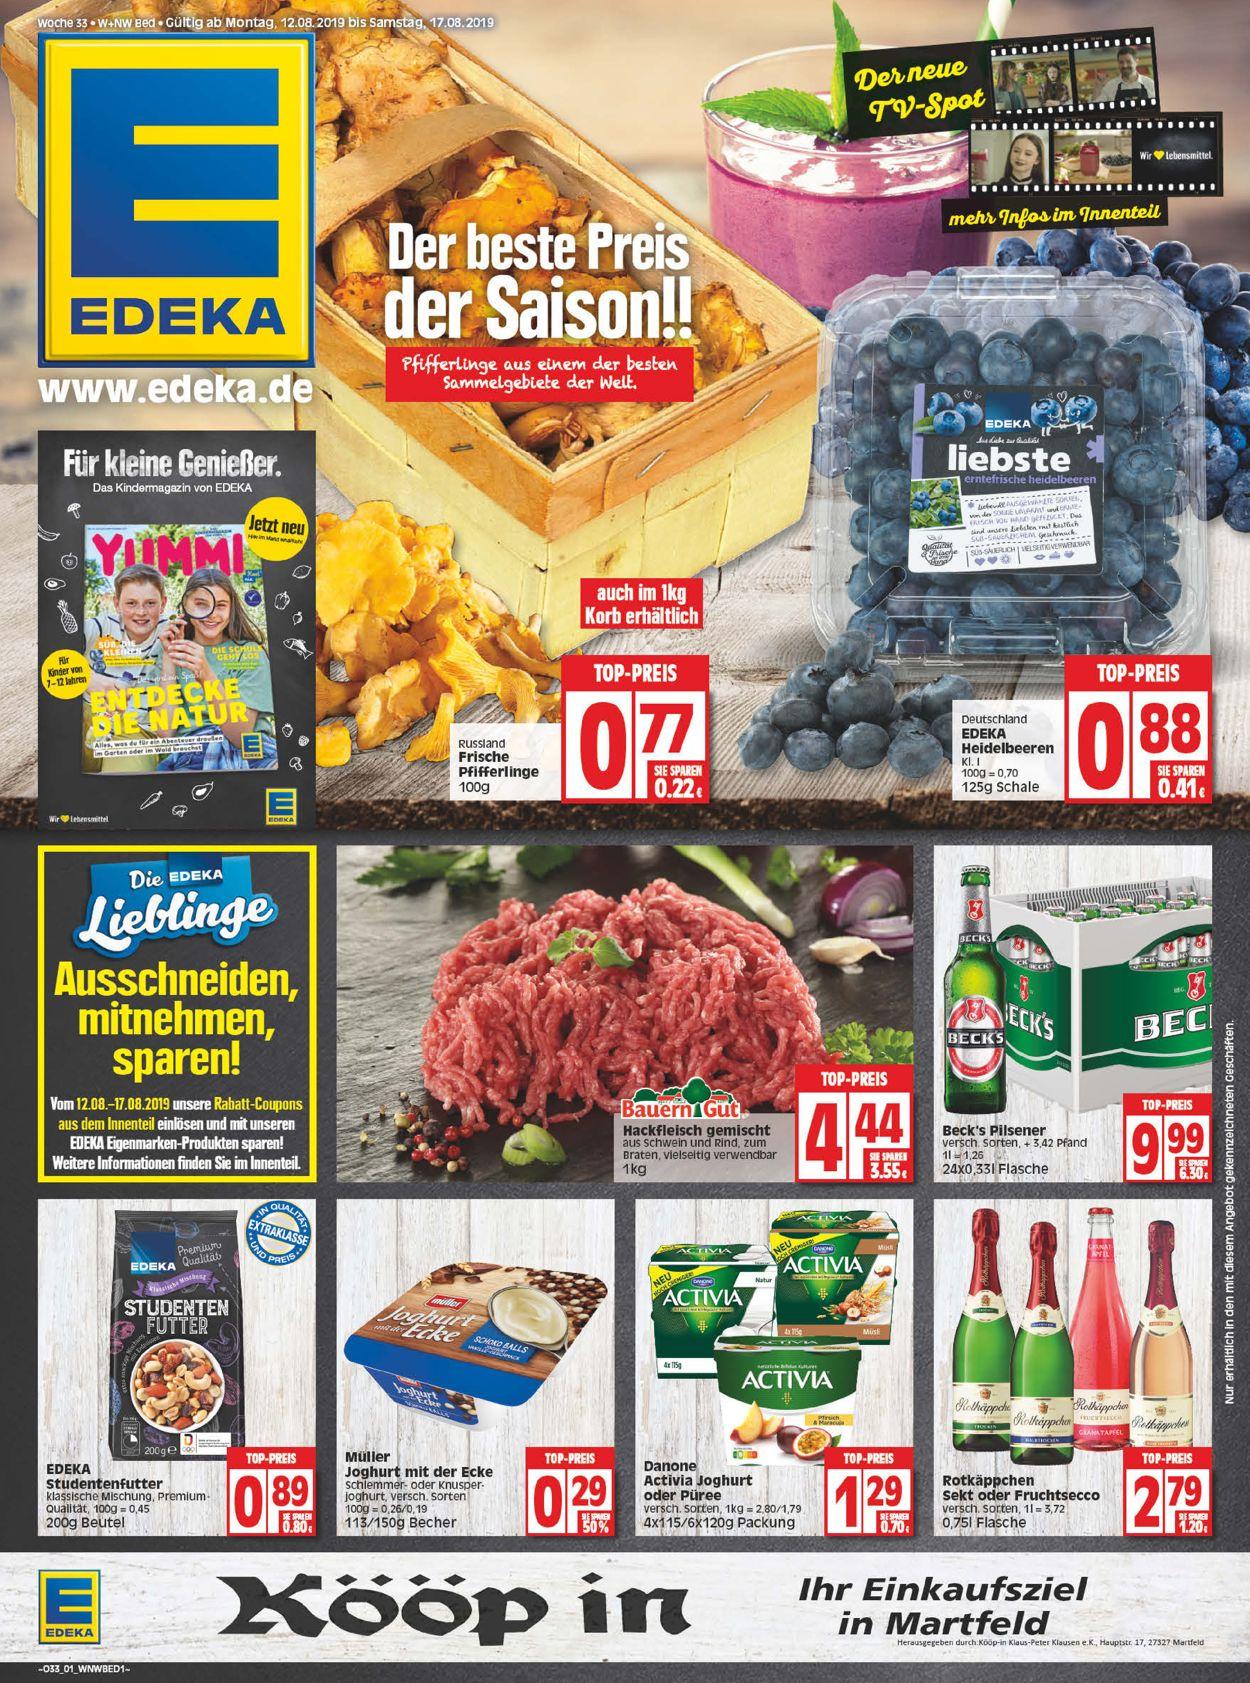 Edeka Prospekt - Aktuell vom 12.08-17.08.2019